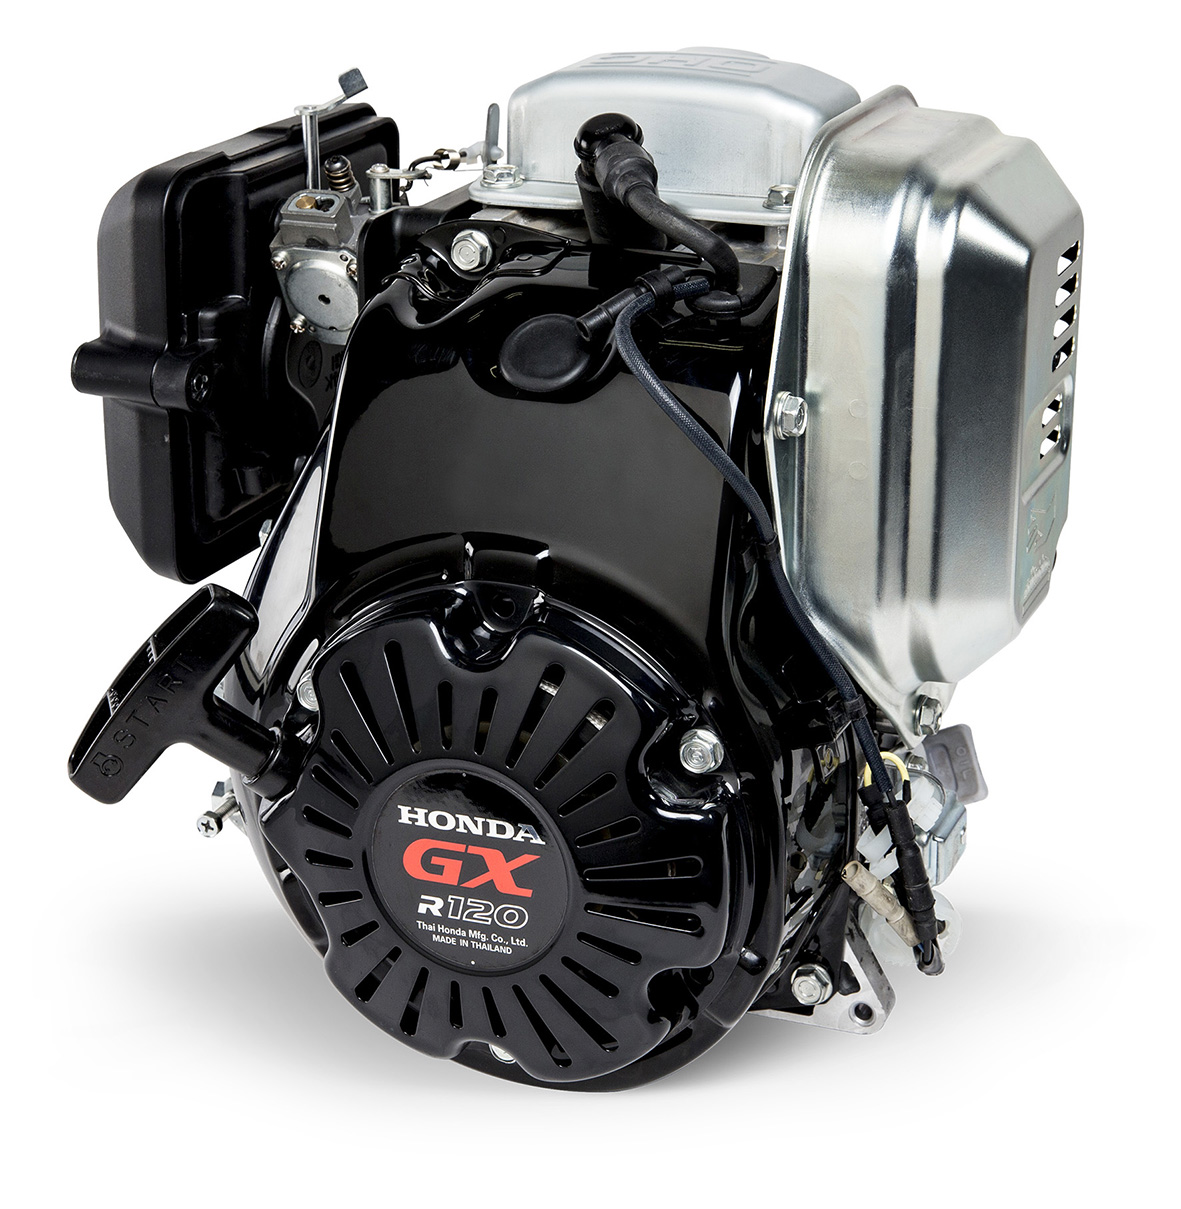 Honda GXR120 Rammer Engine